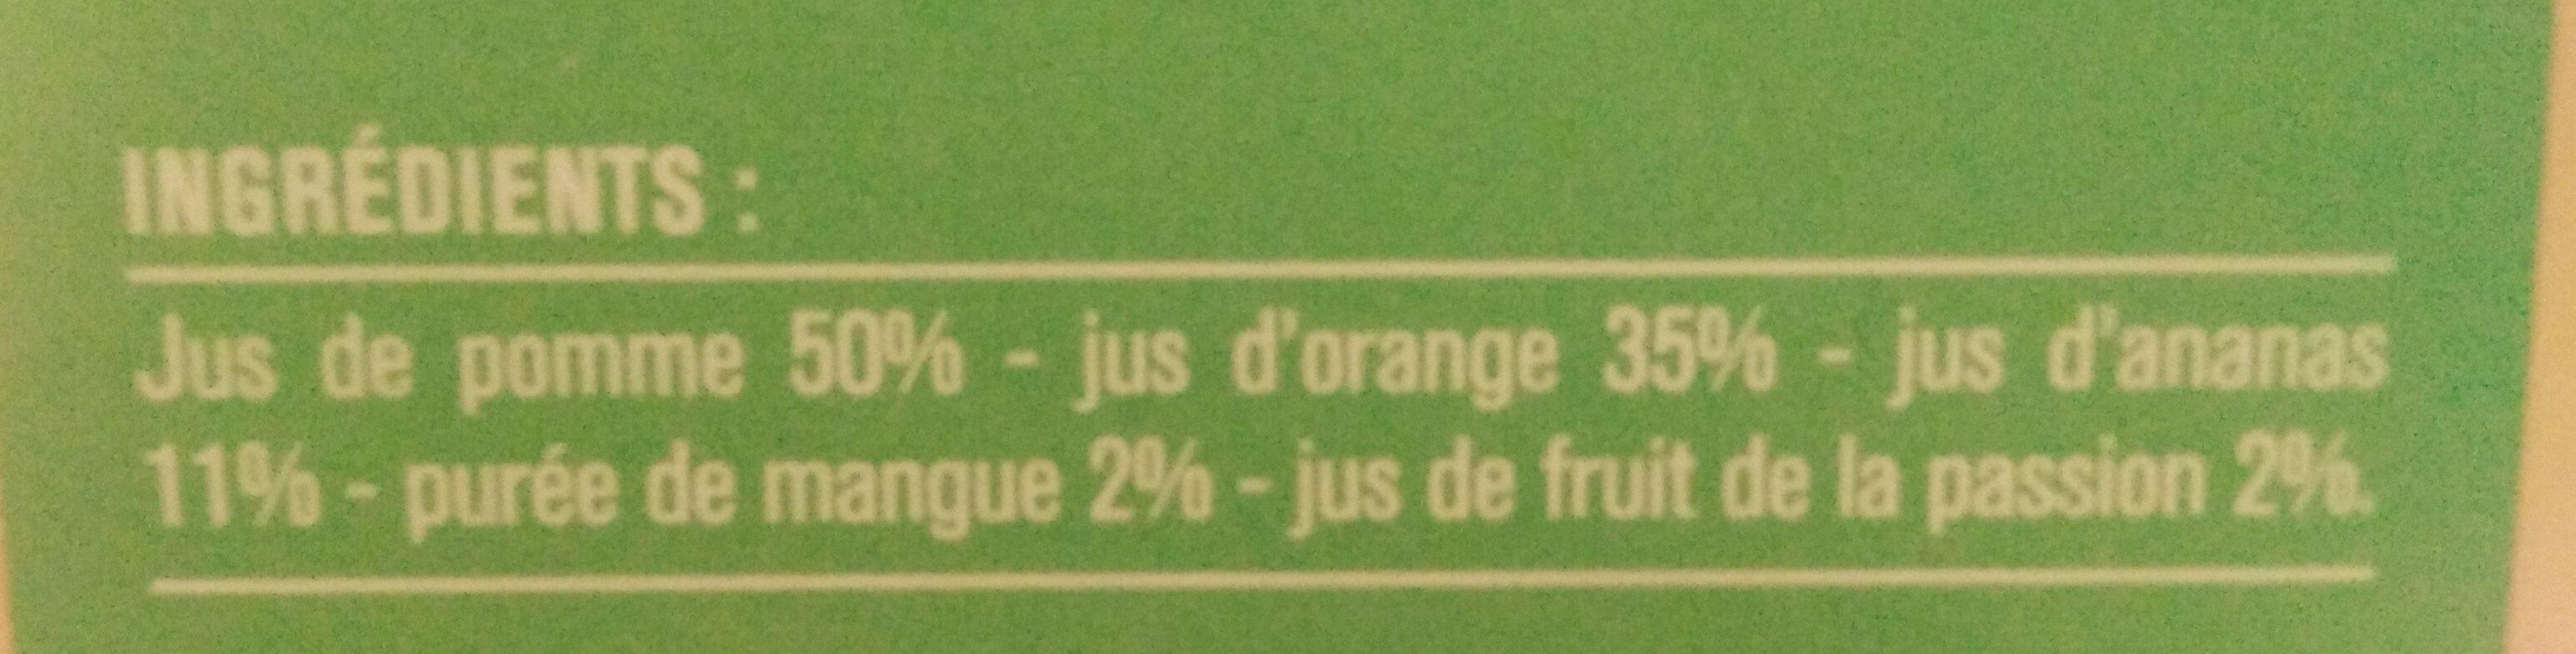 100% pur jus Ananas Mangue Passion - Ingrédients - fr